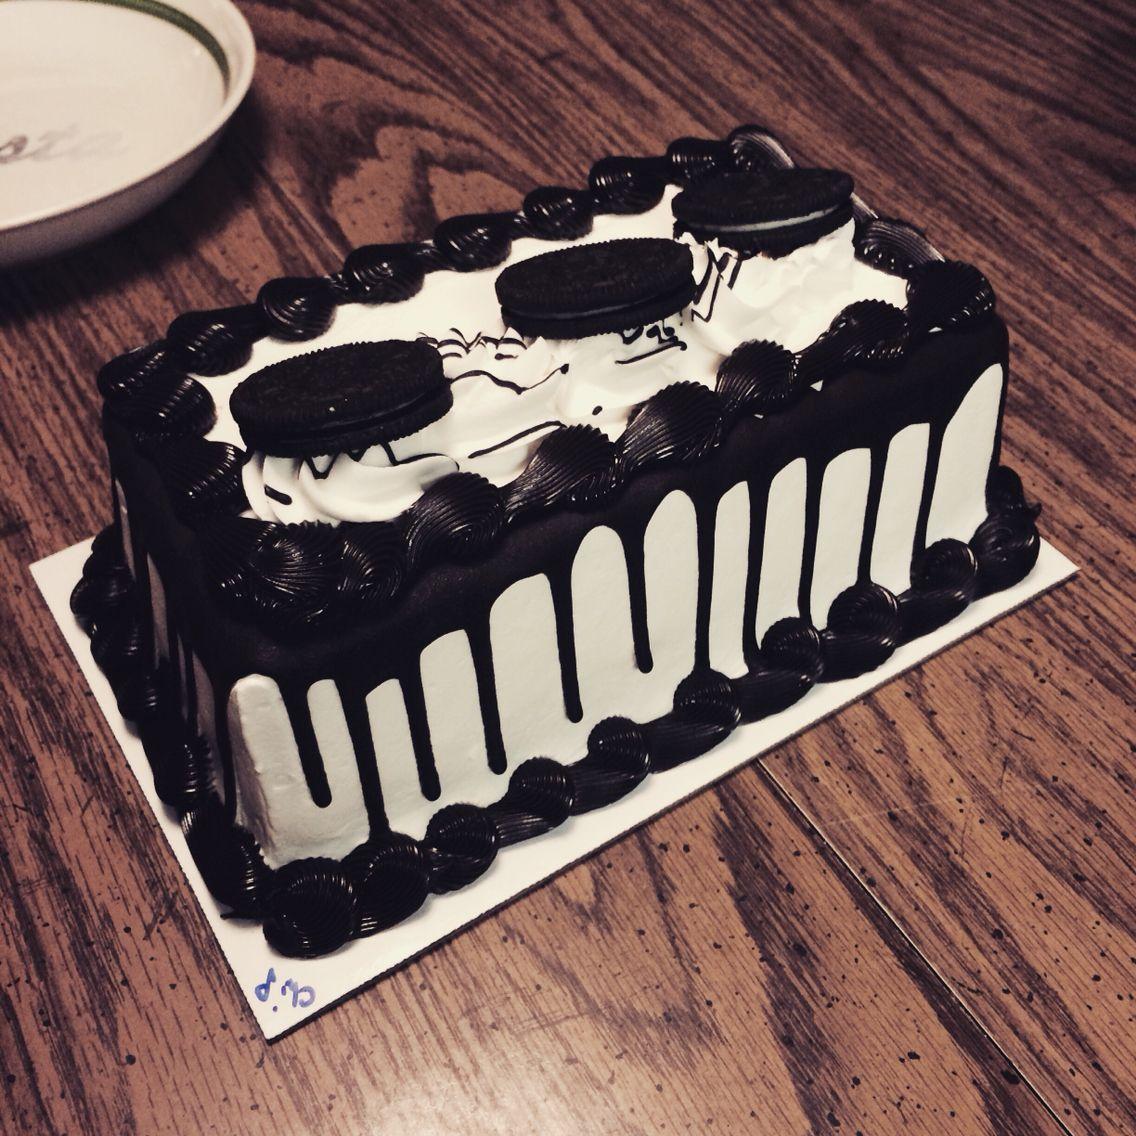 Baskin robbins oreo ice cream cake oreo ice cream cake